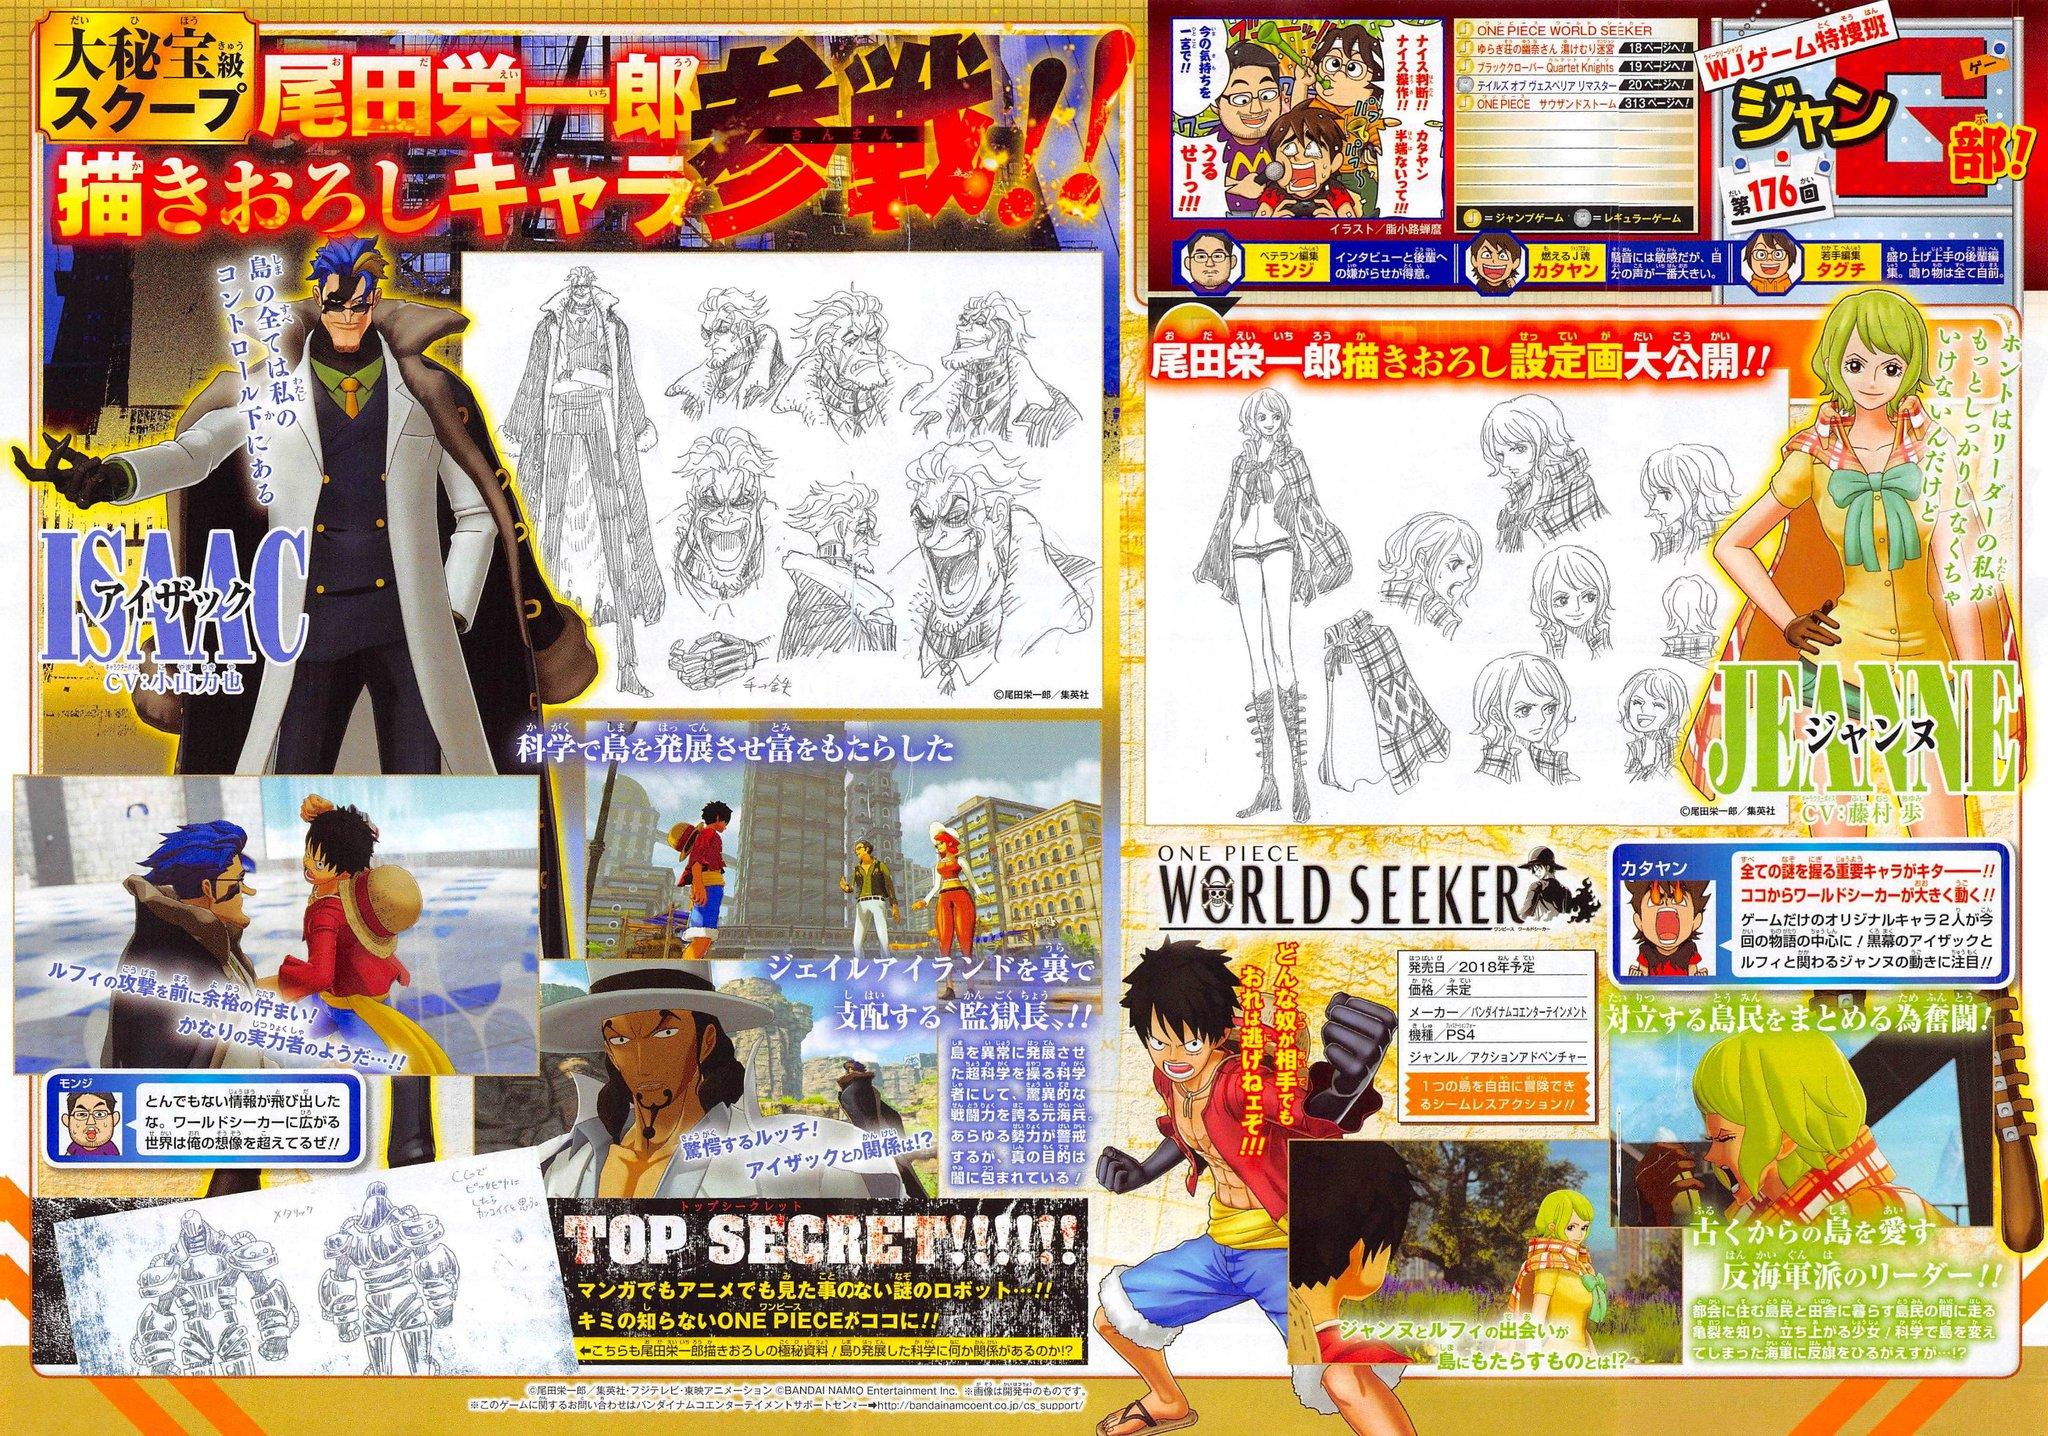 One Piece World Seeker Scan